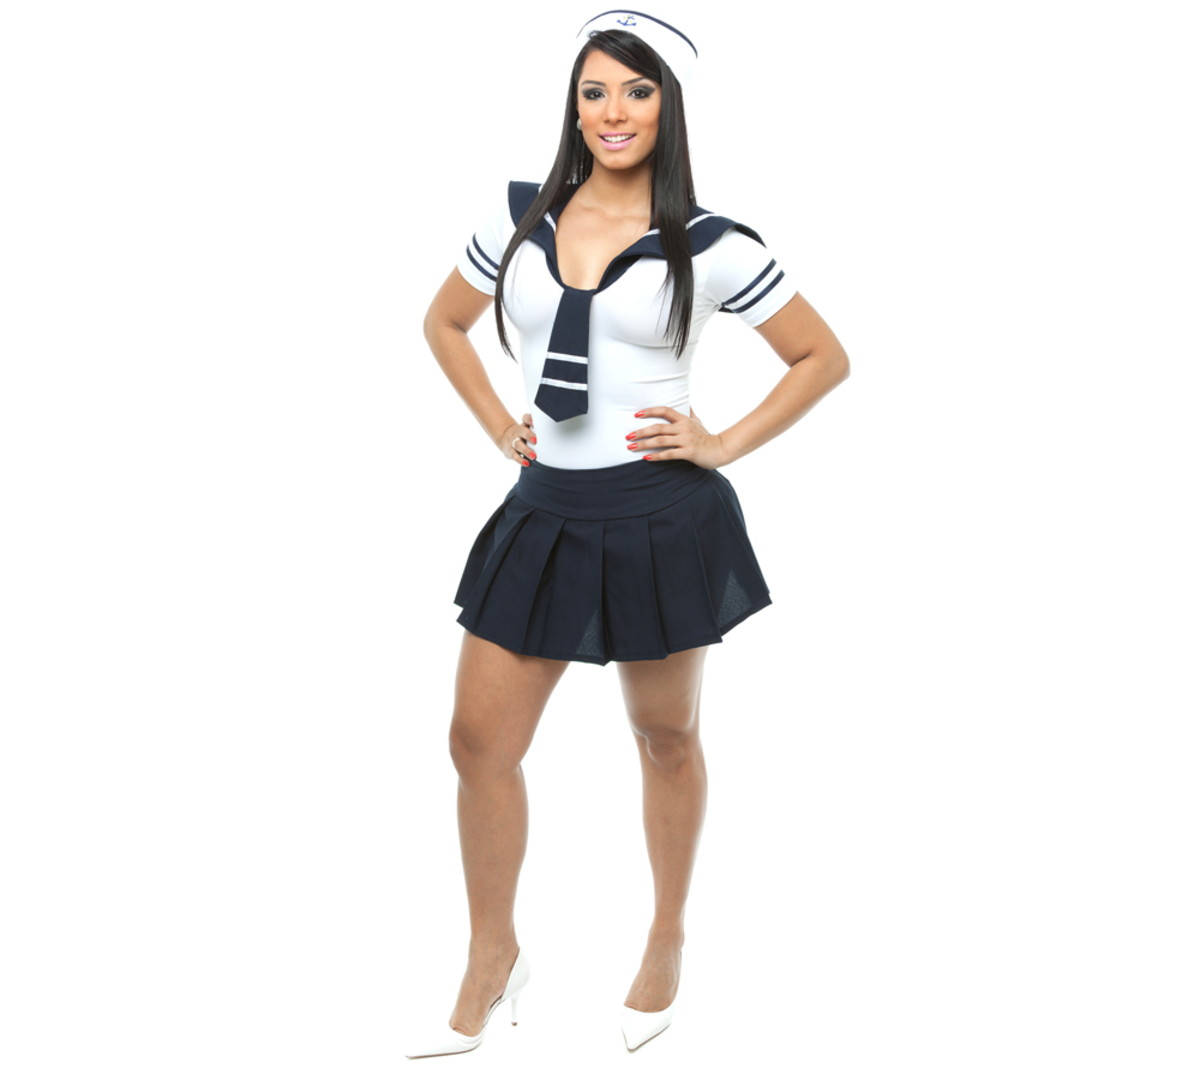 bc5752c22 Fantasia Marinheira Sexy Adulto Carnaval no Elo7